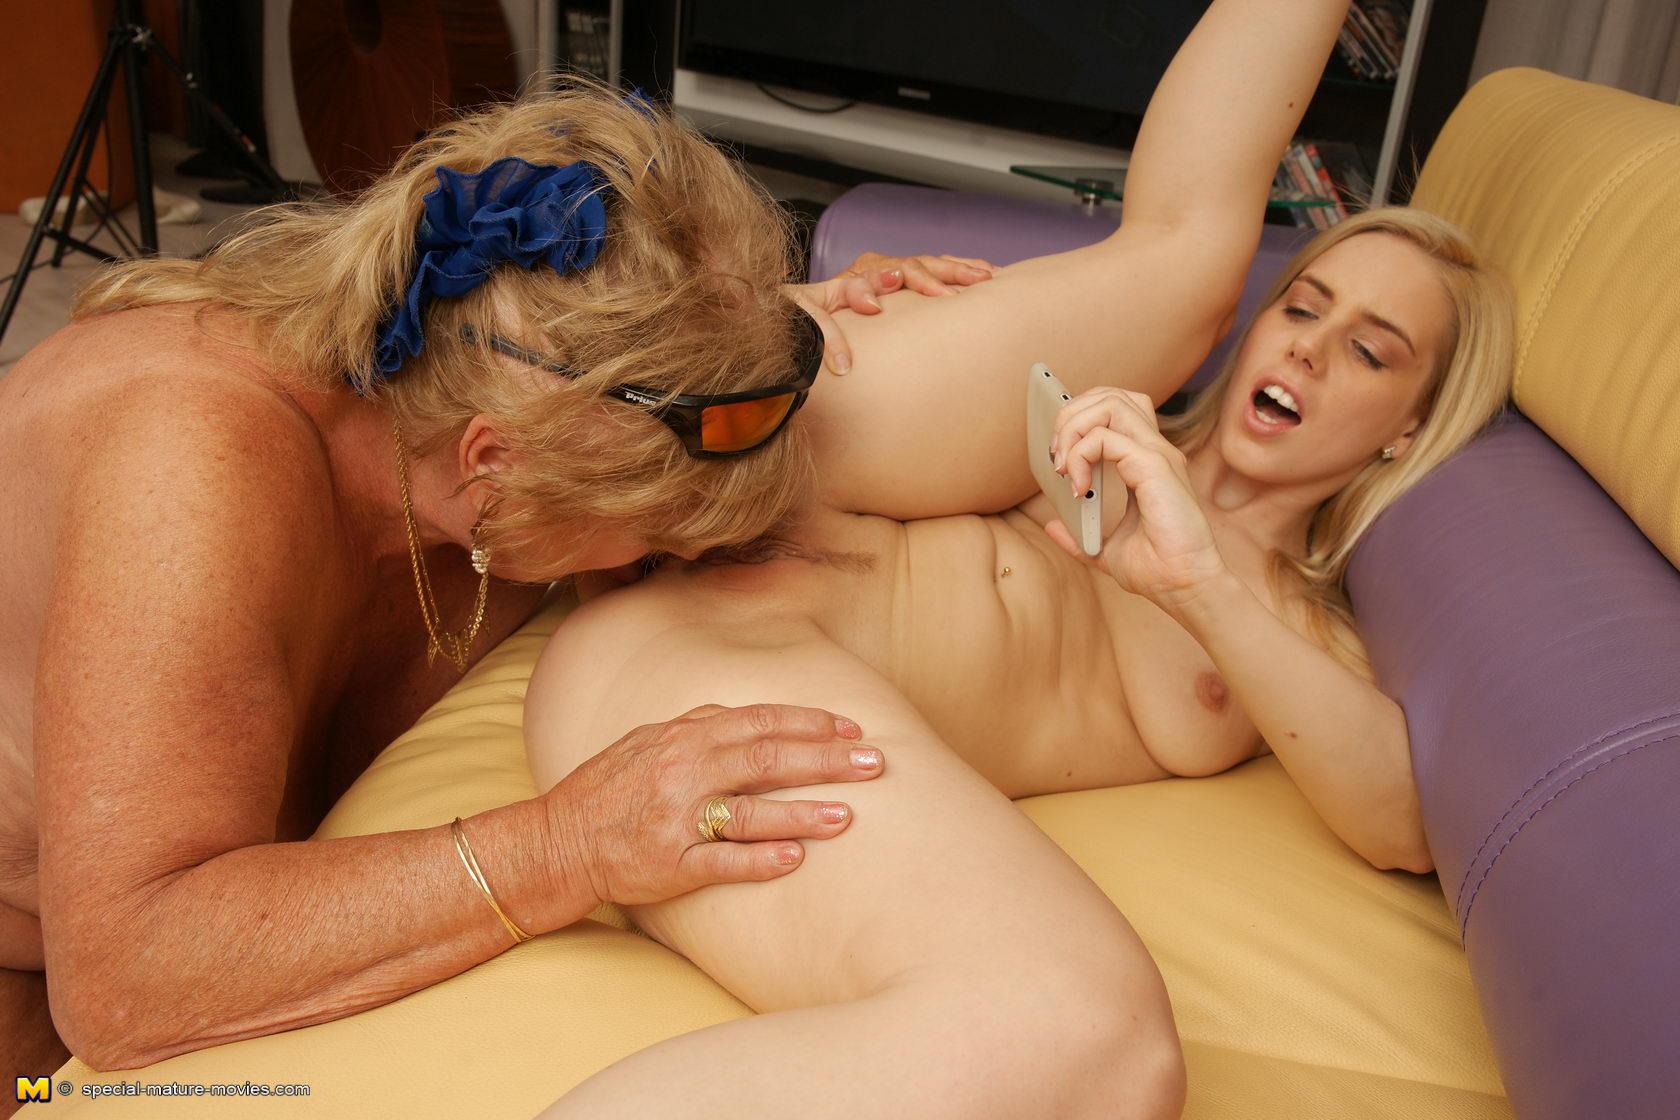 girlfriend holiday photo sex